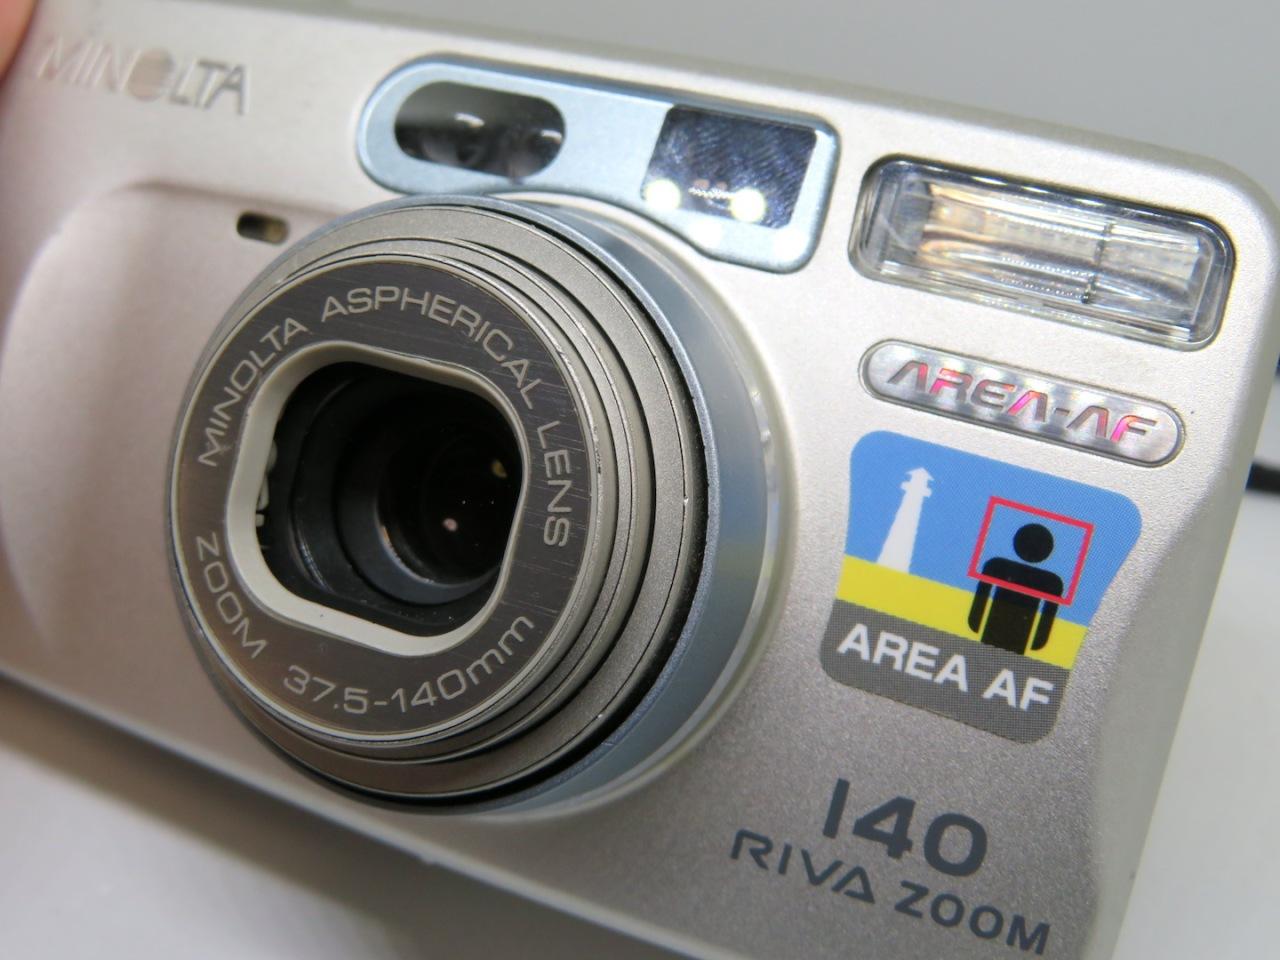 Minolta 140 Riva Zoom (capios140A)